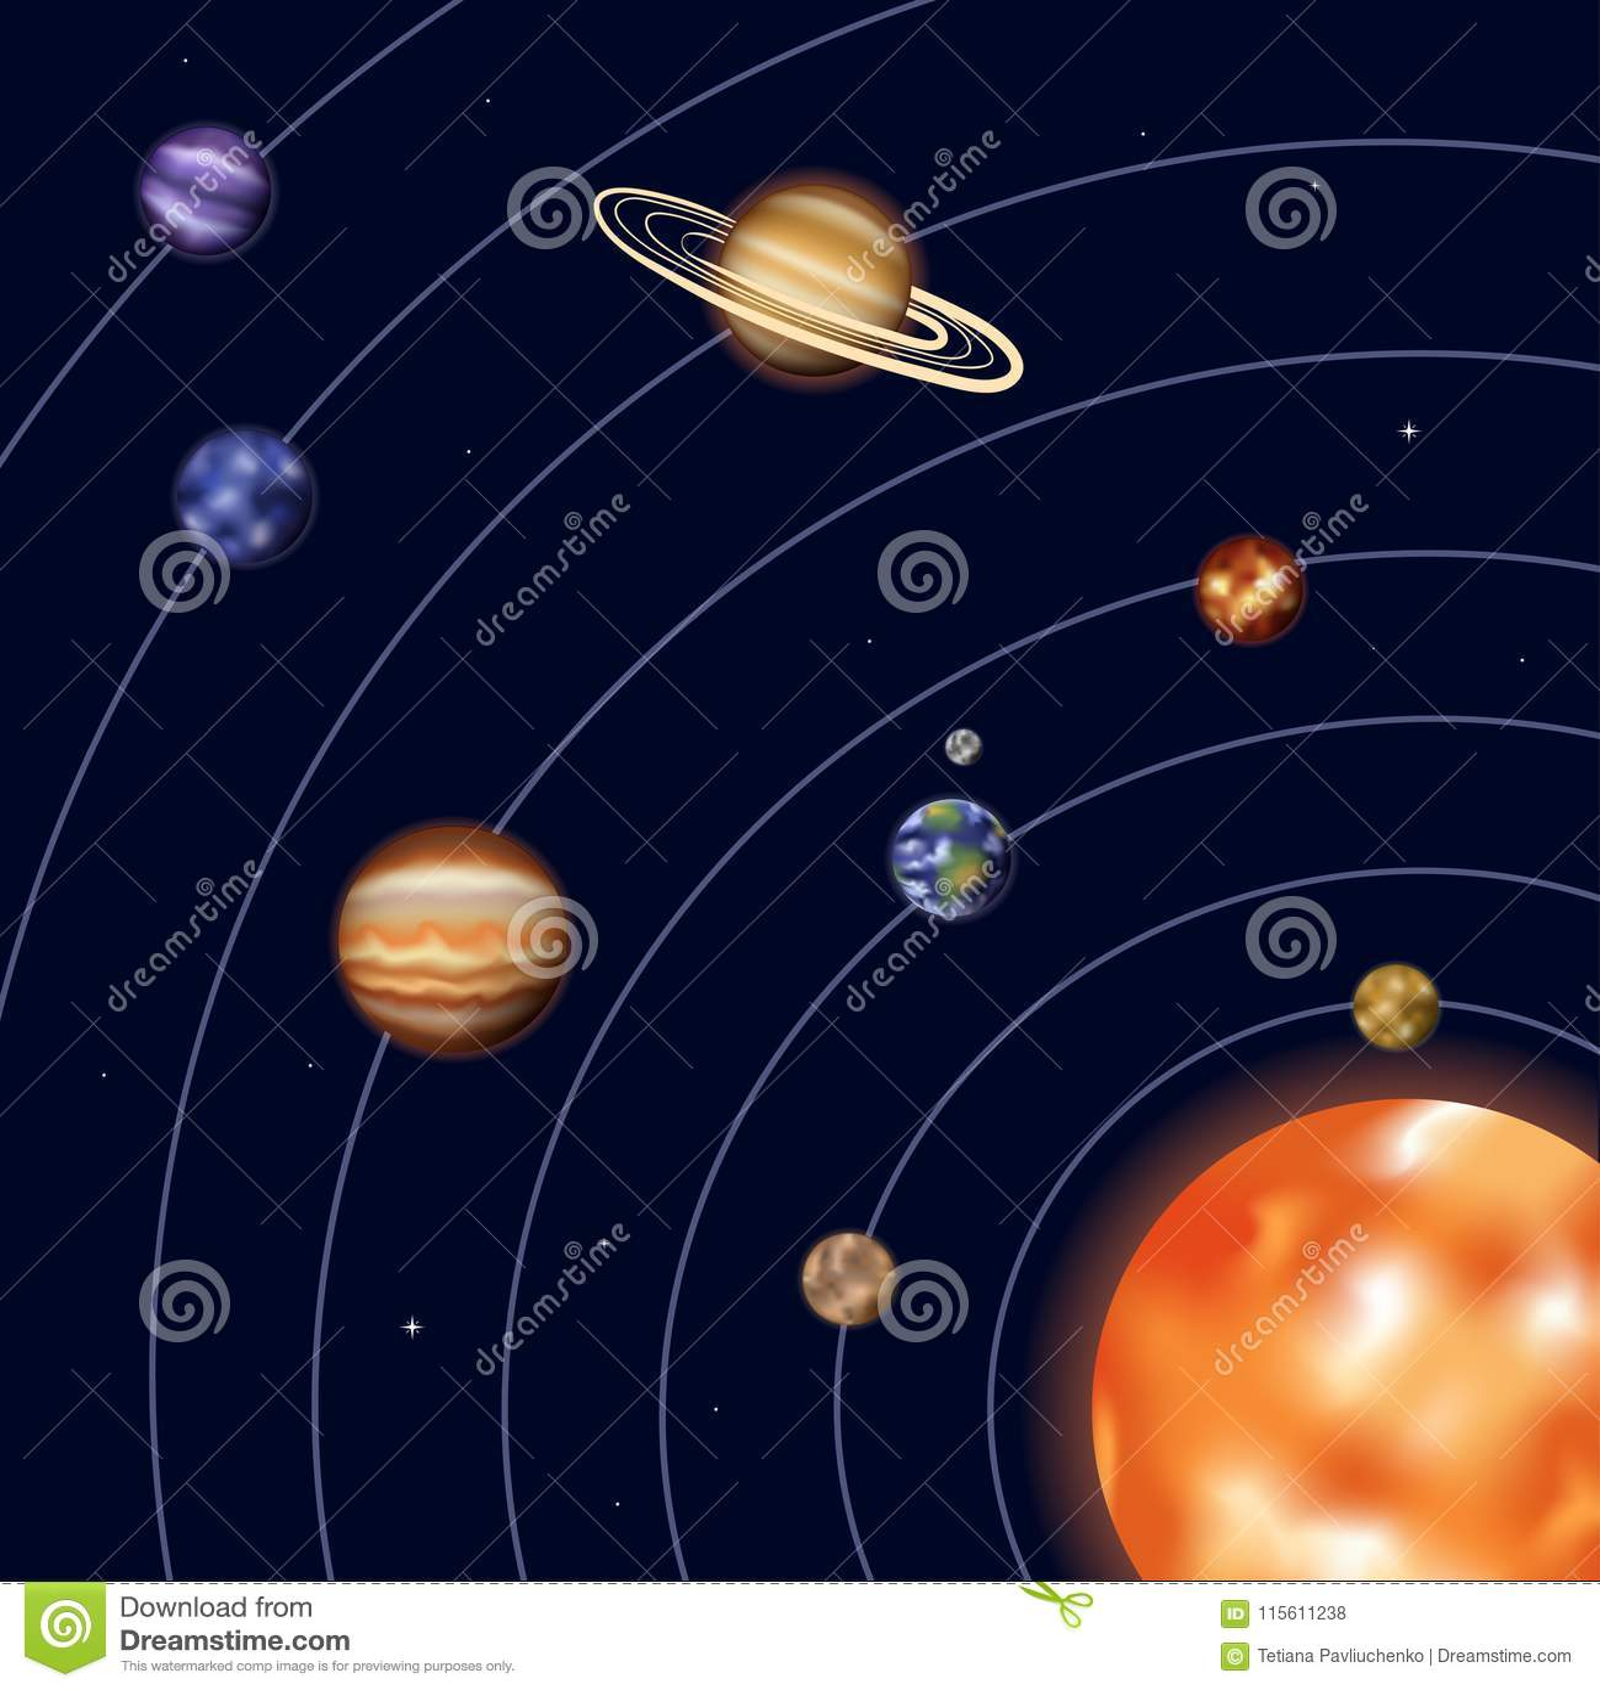 Includin The Solar System Diagram Of Earths Moon Modern Design Universe Today Vector Illustration Stock Rh Dreamstime Com